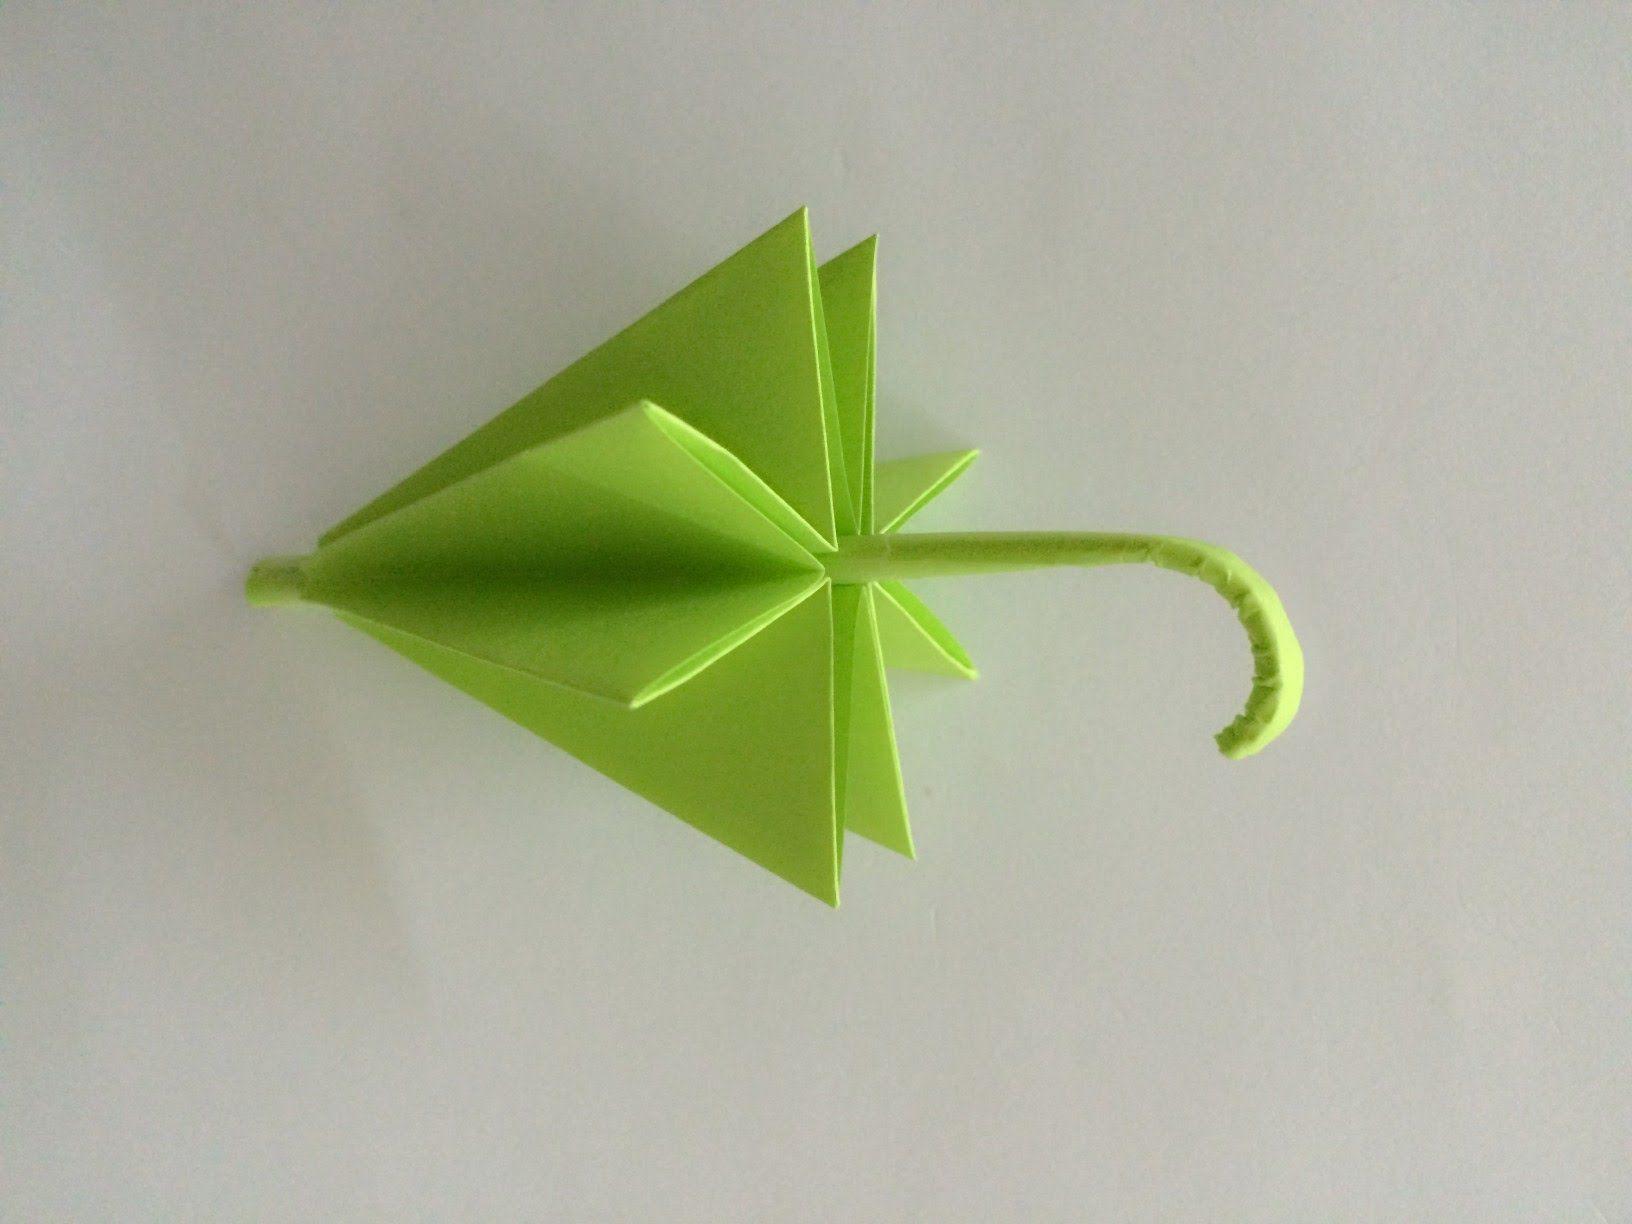 Pin on Origami,kusudama